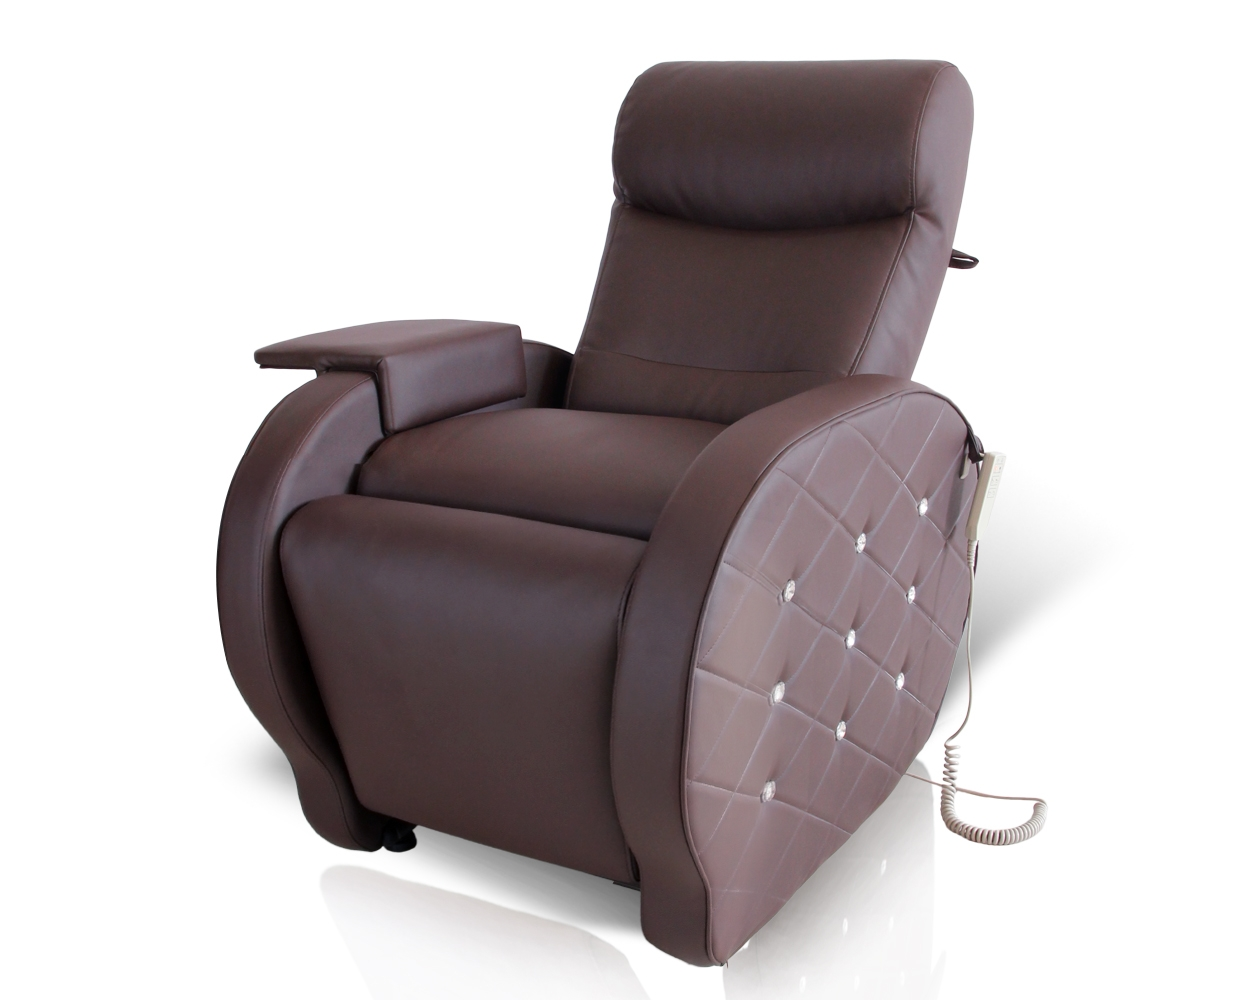 Pedicure Stoel Goedkoop : Manicure pedicure stoelen leverancier pedicure stoel fabriek